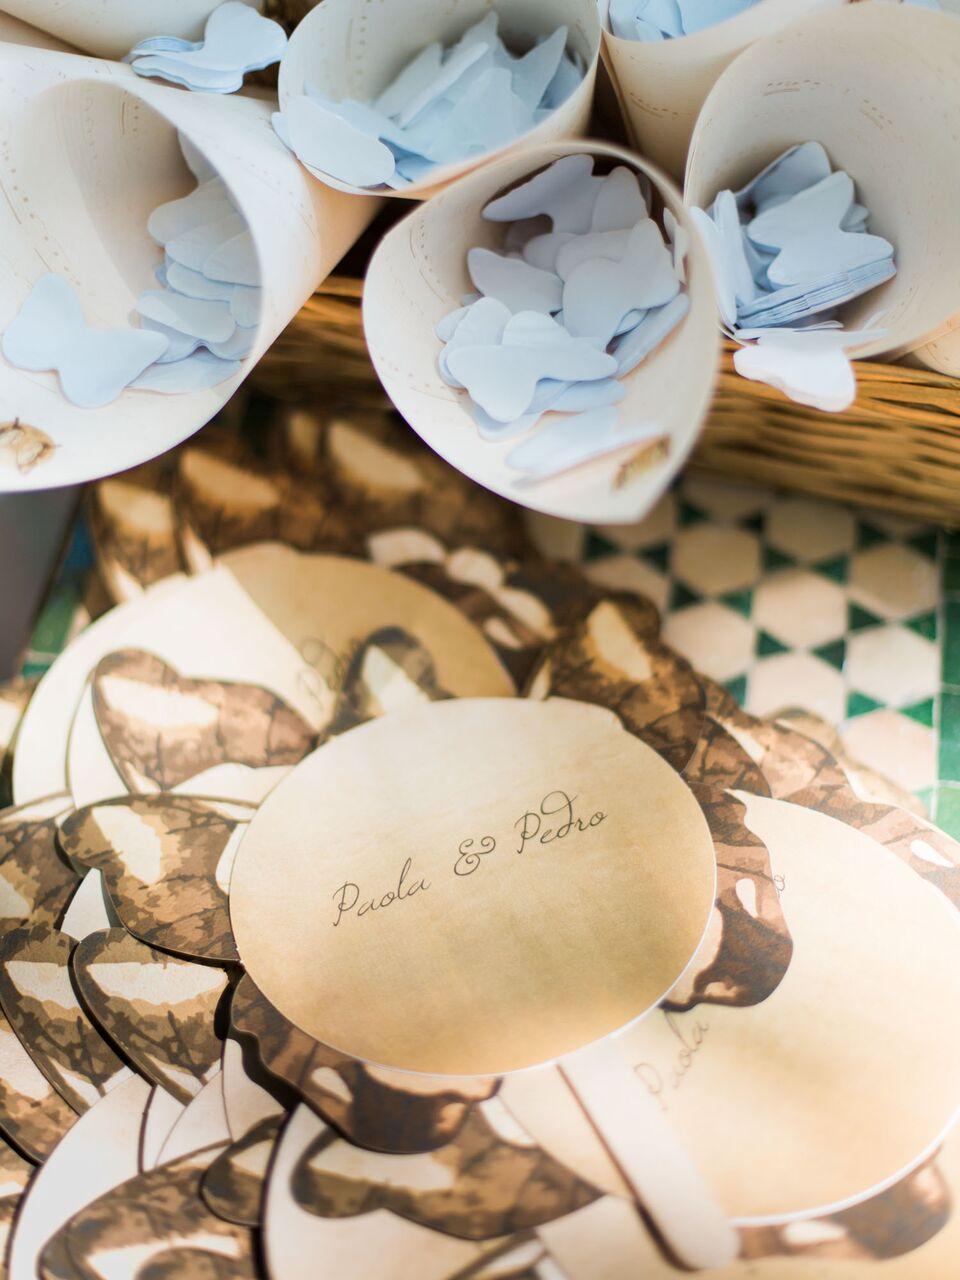 Si-Quiero-Wedding-Planner-By-Sira-Antequera-Paola-Pedro-7